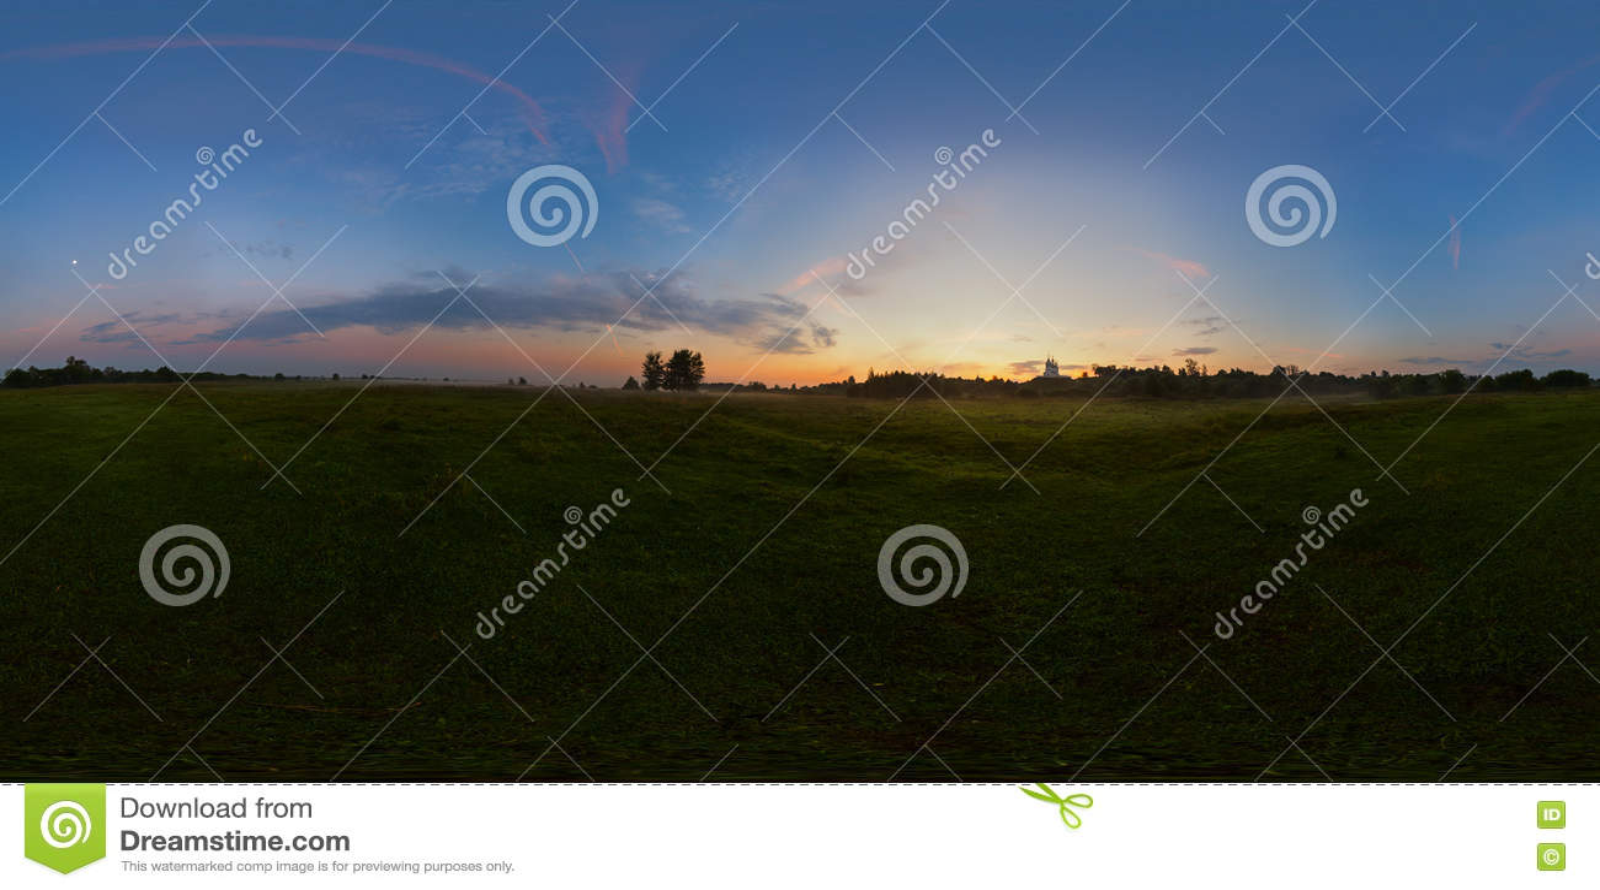 Mistige zonsopgang op weide sferisch panorama